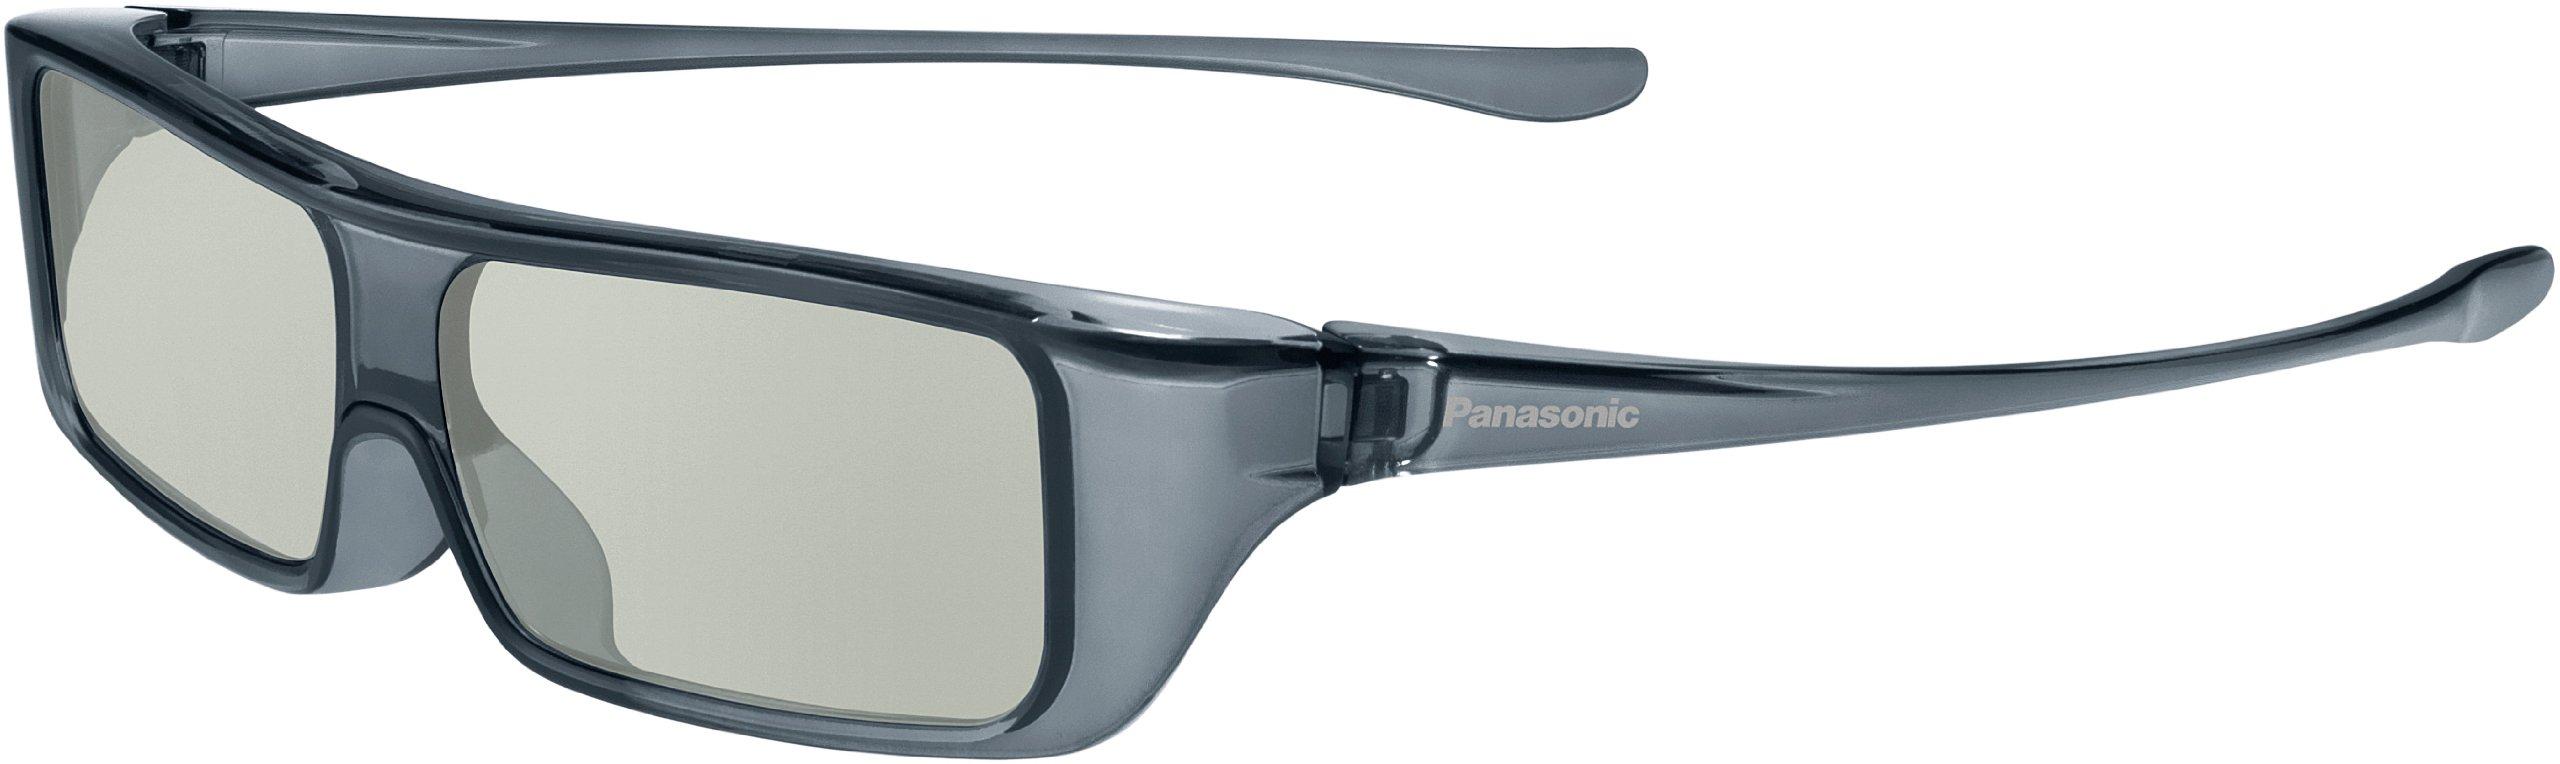 NEW OEM Panasonic Polarized 3D Glasses TY-EP3D20 by Panasonic